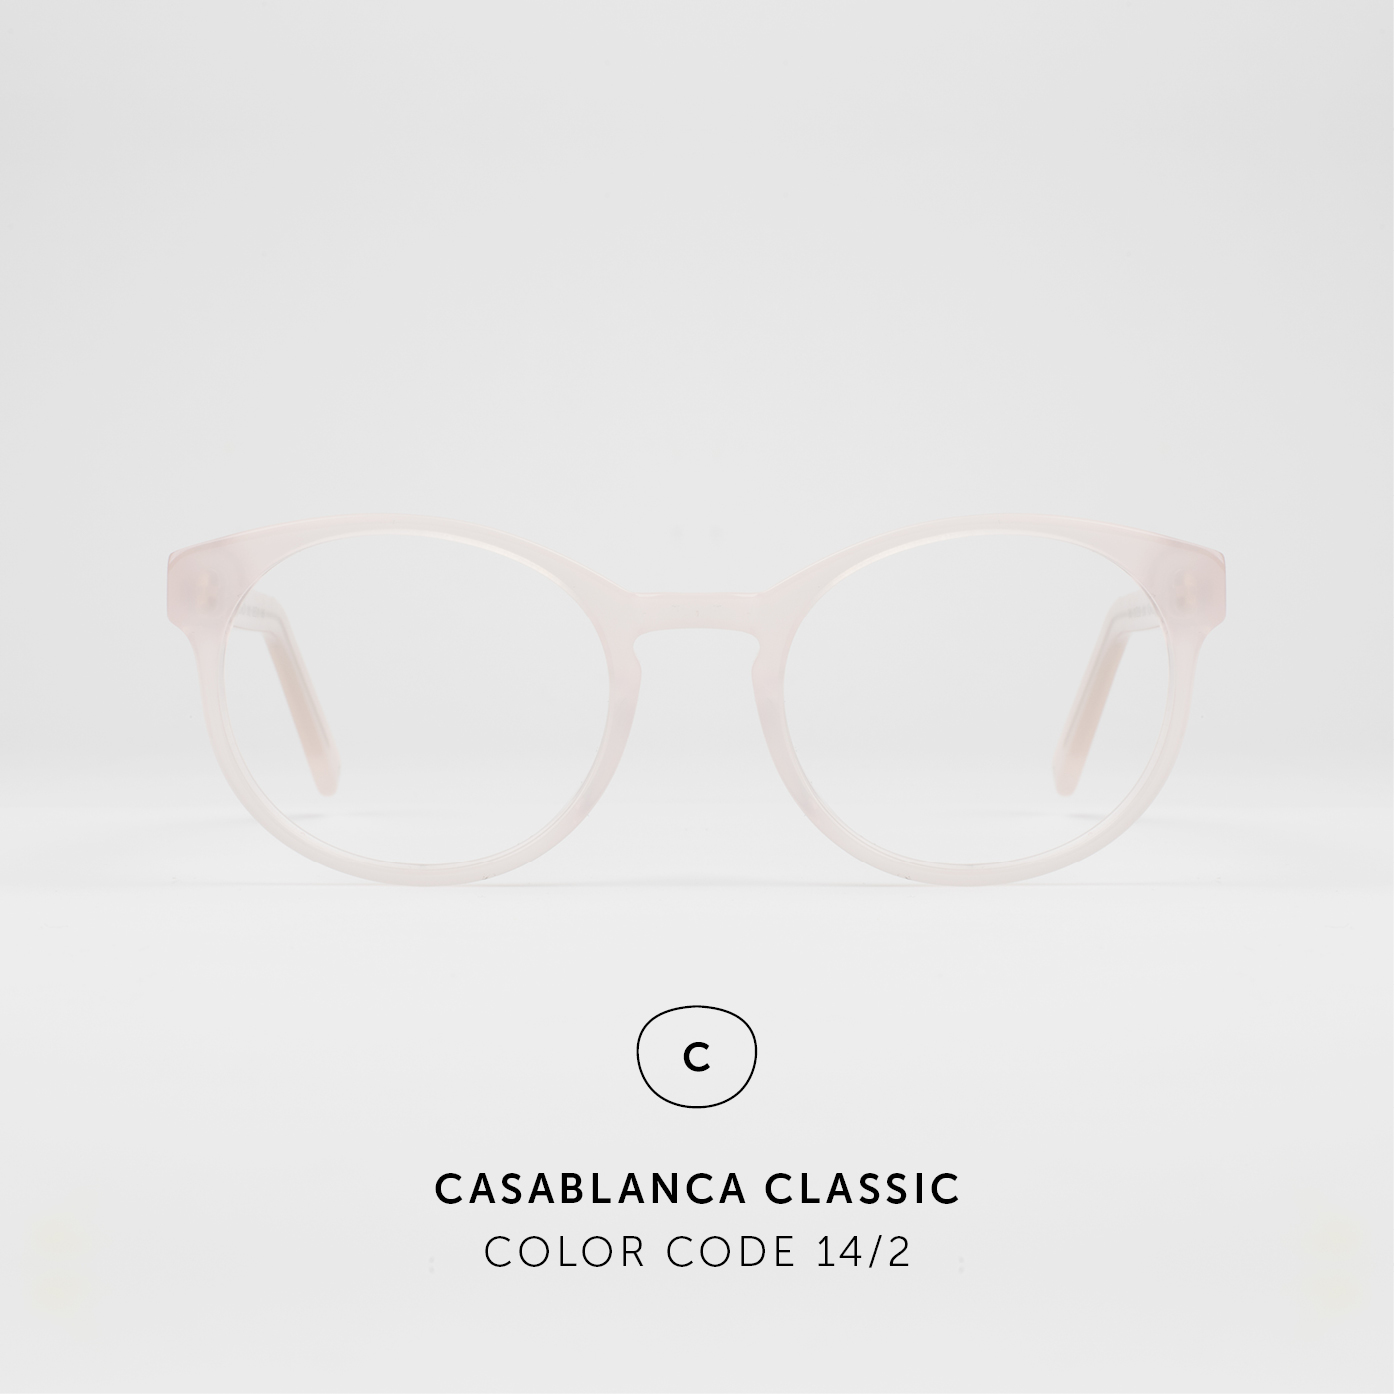 CasablancaClassic33.jpg